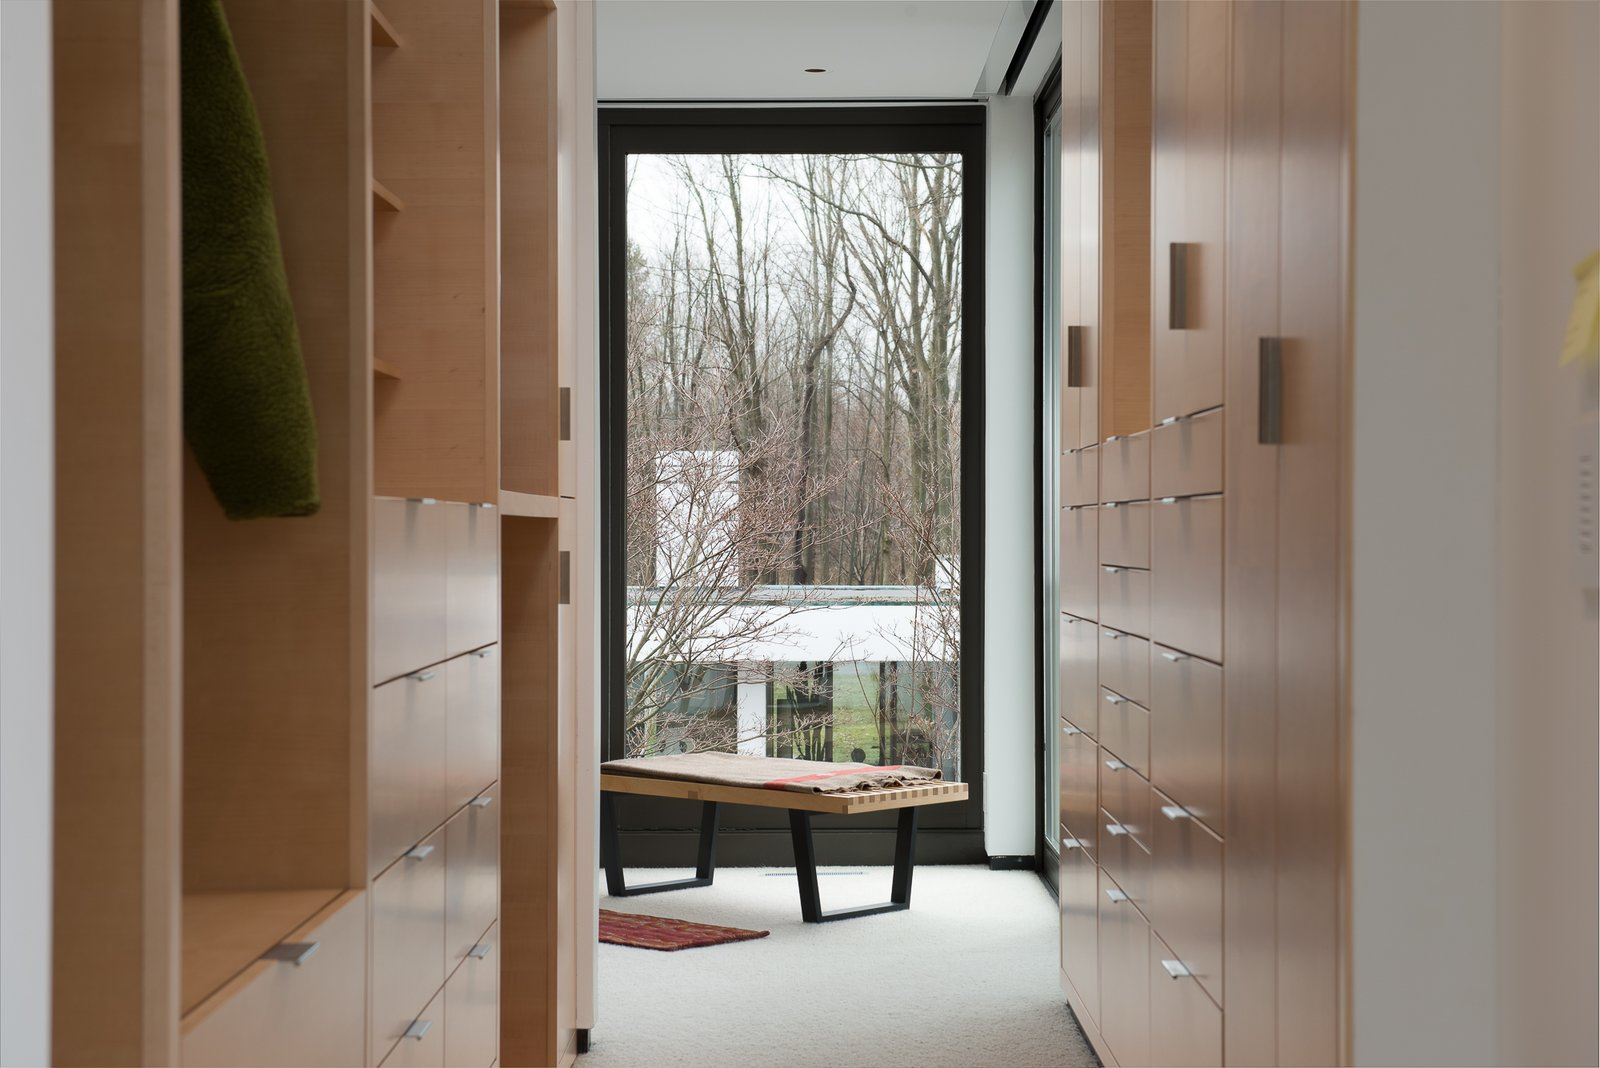 10 Modern Walk-In Closets